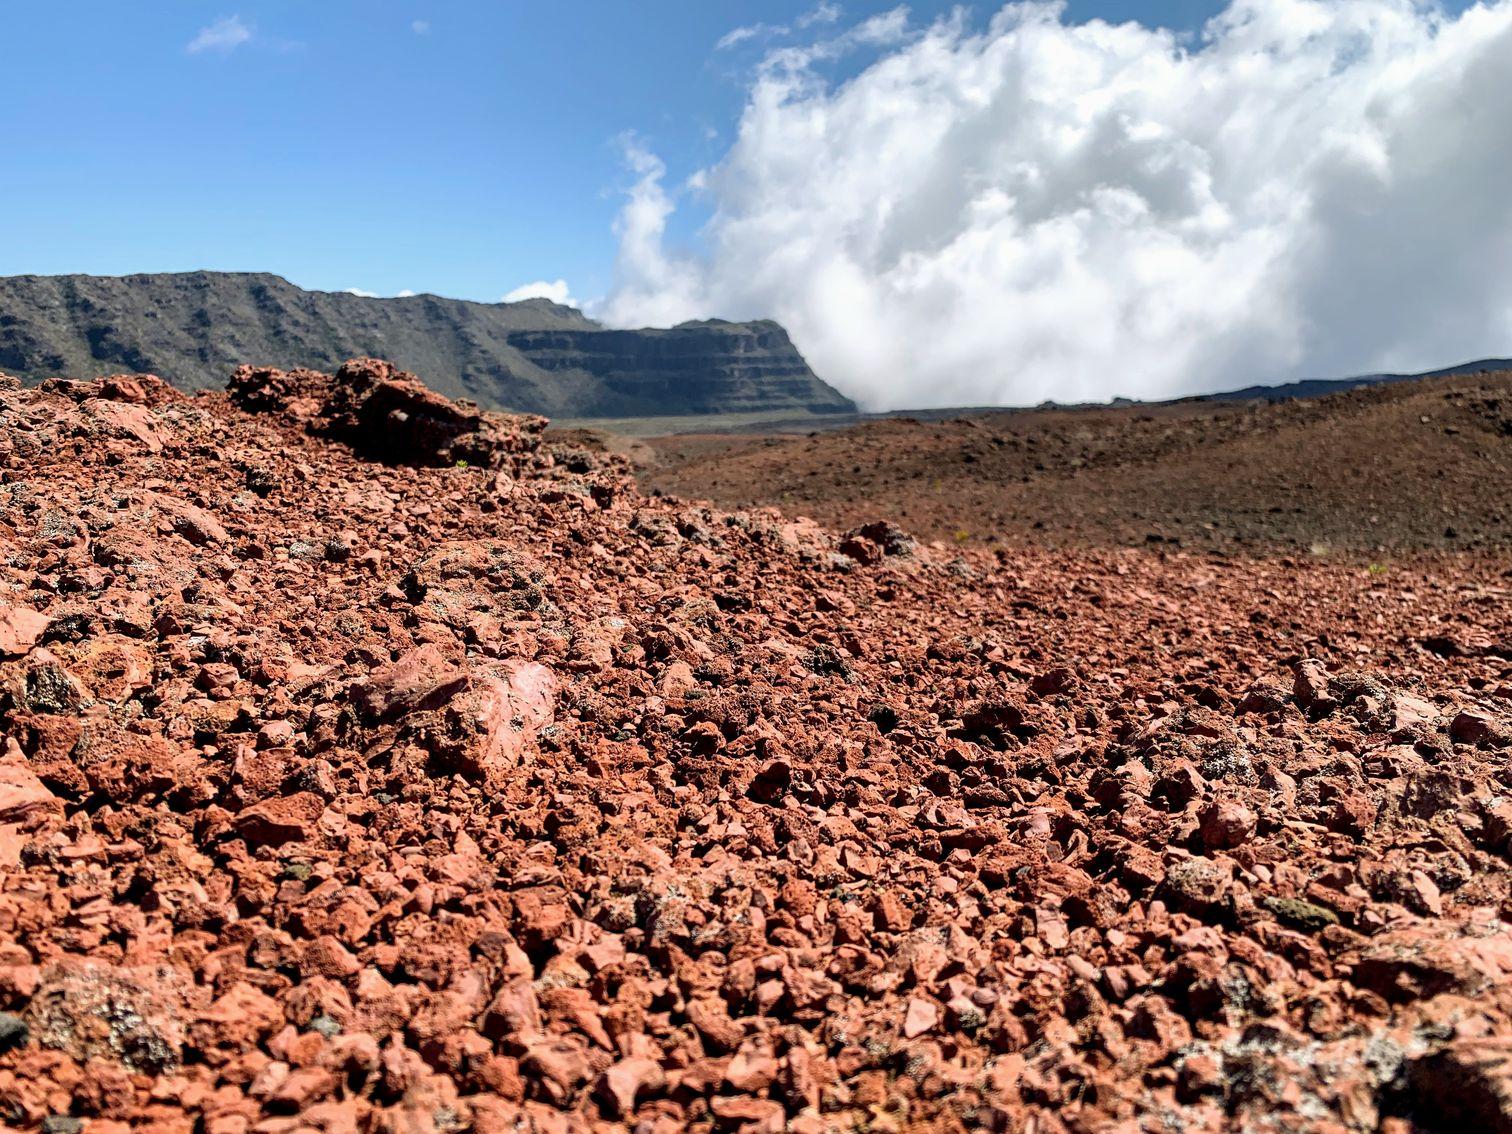 Martian landscape near Piton de la Fournaise